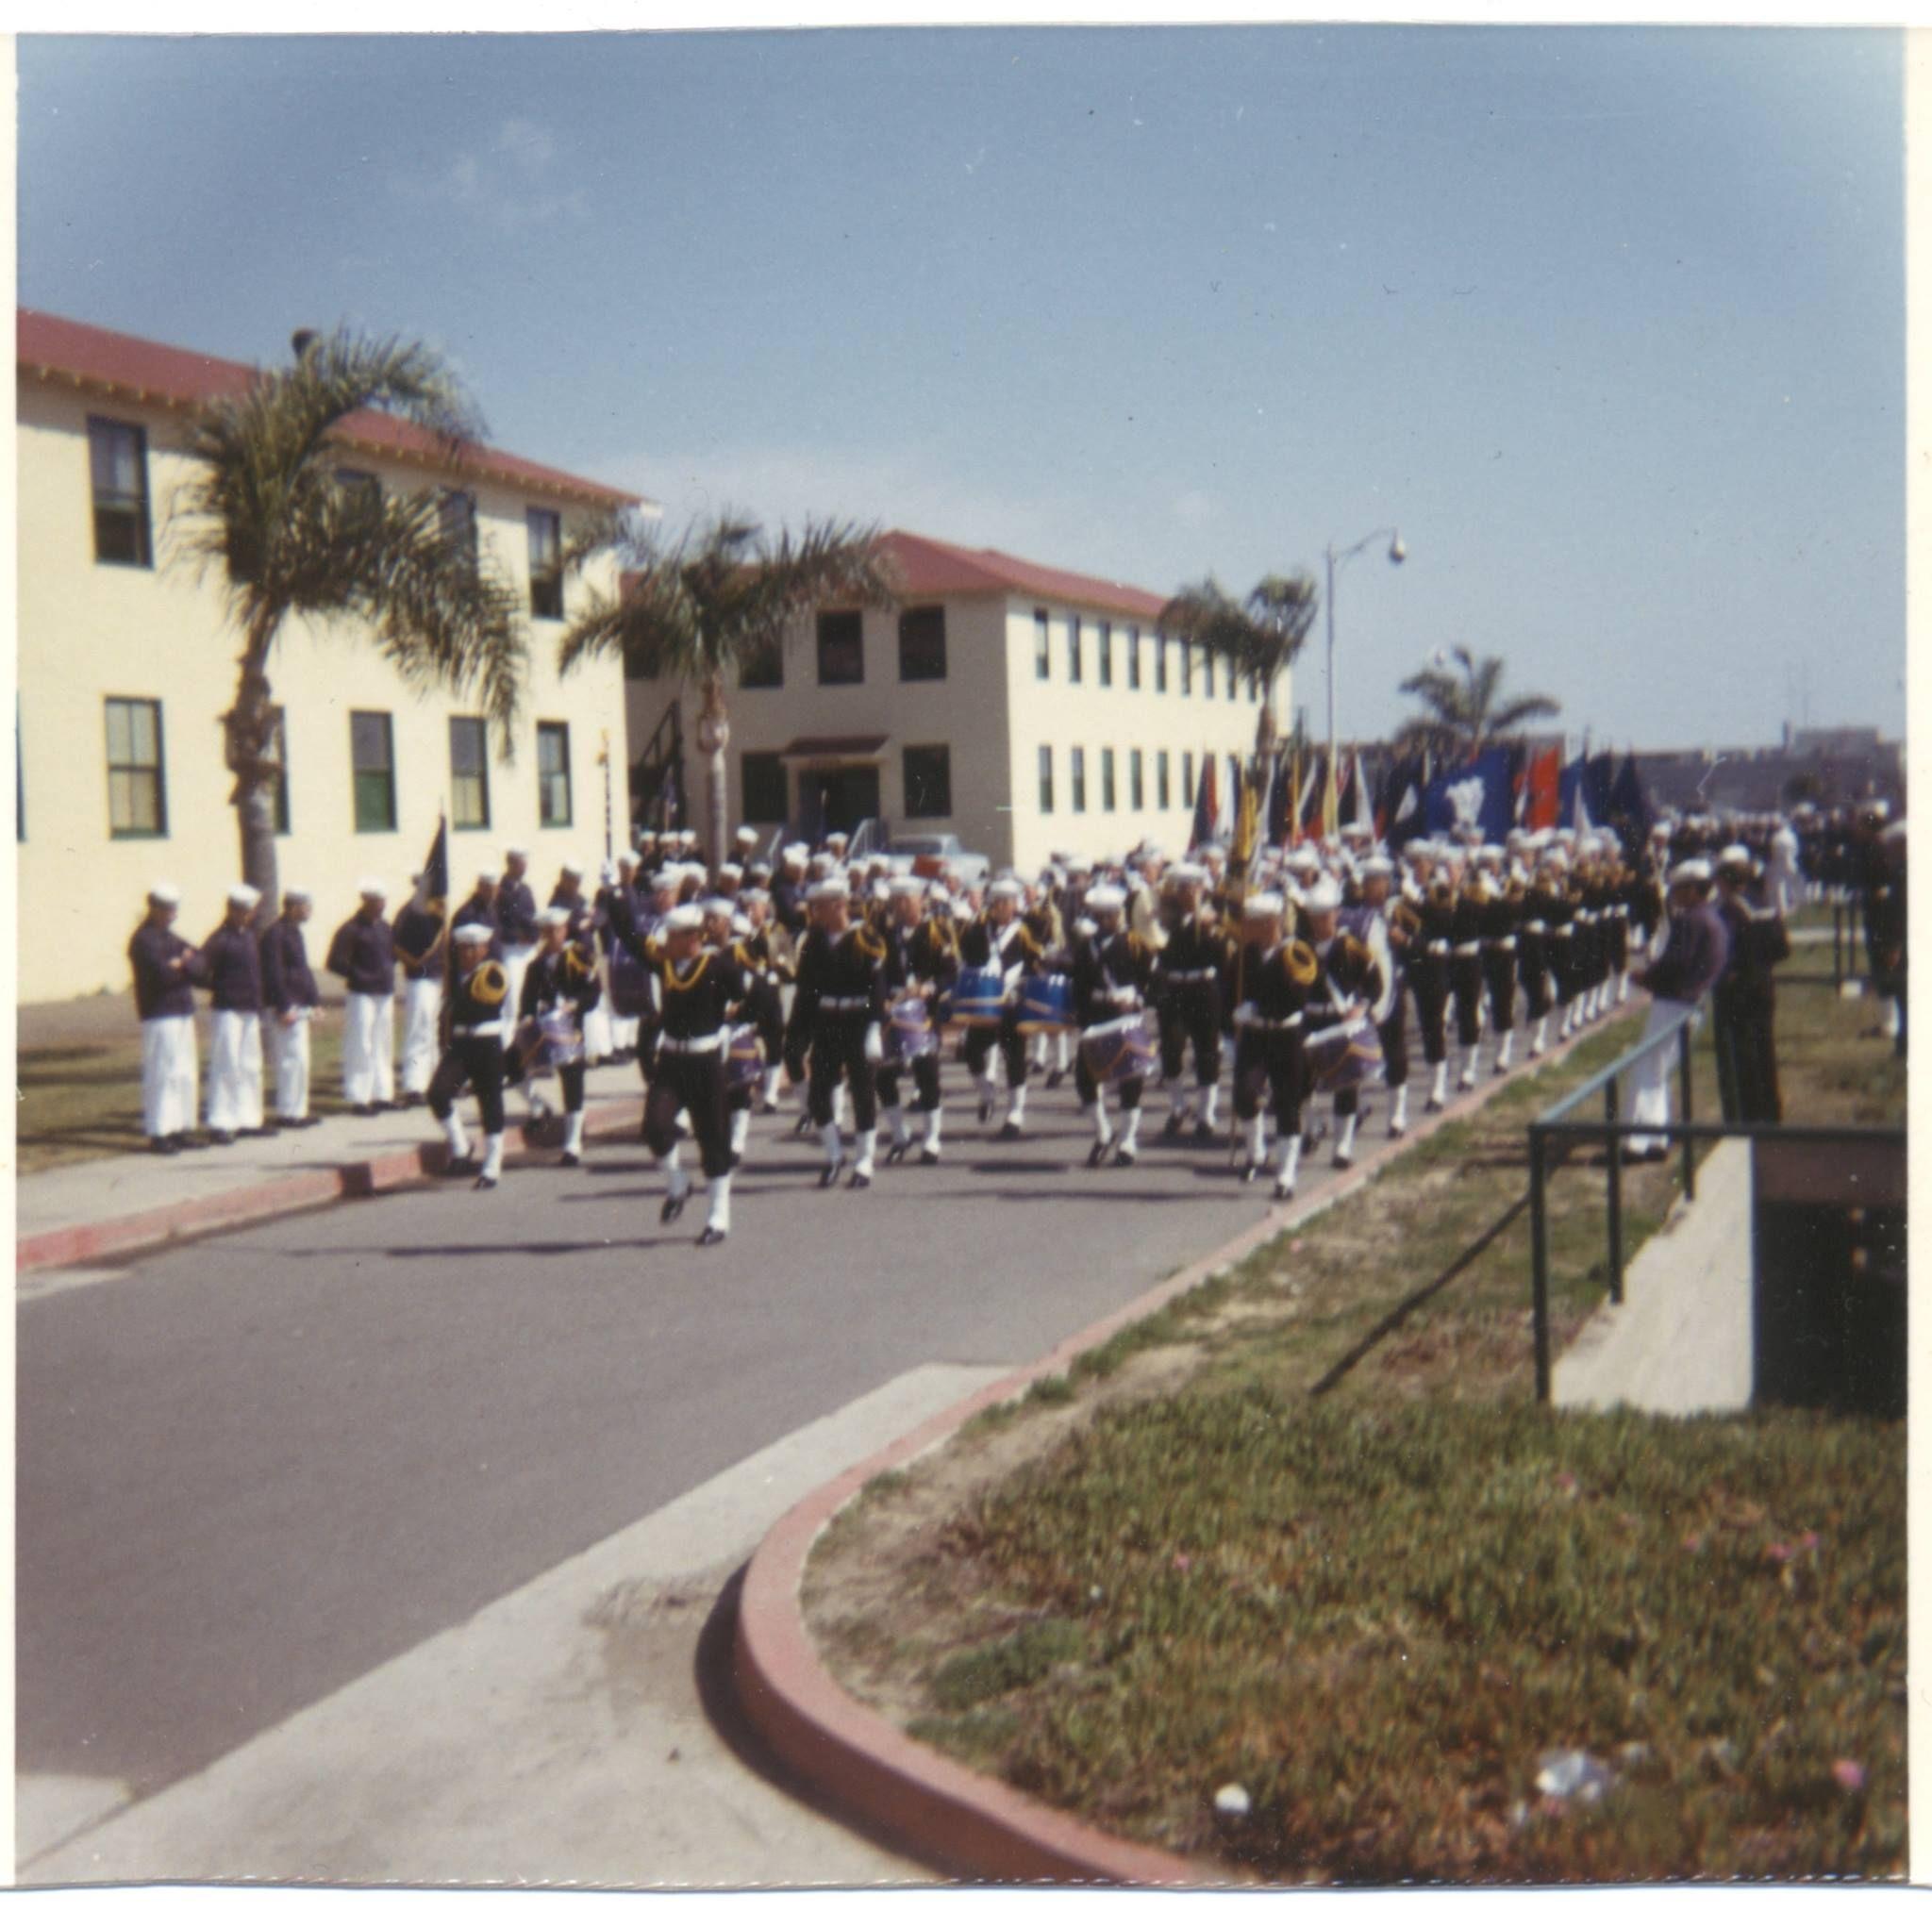 Pin By Kenny P On Navy Navy Day Navy Training Navy Duty Stations